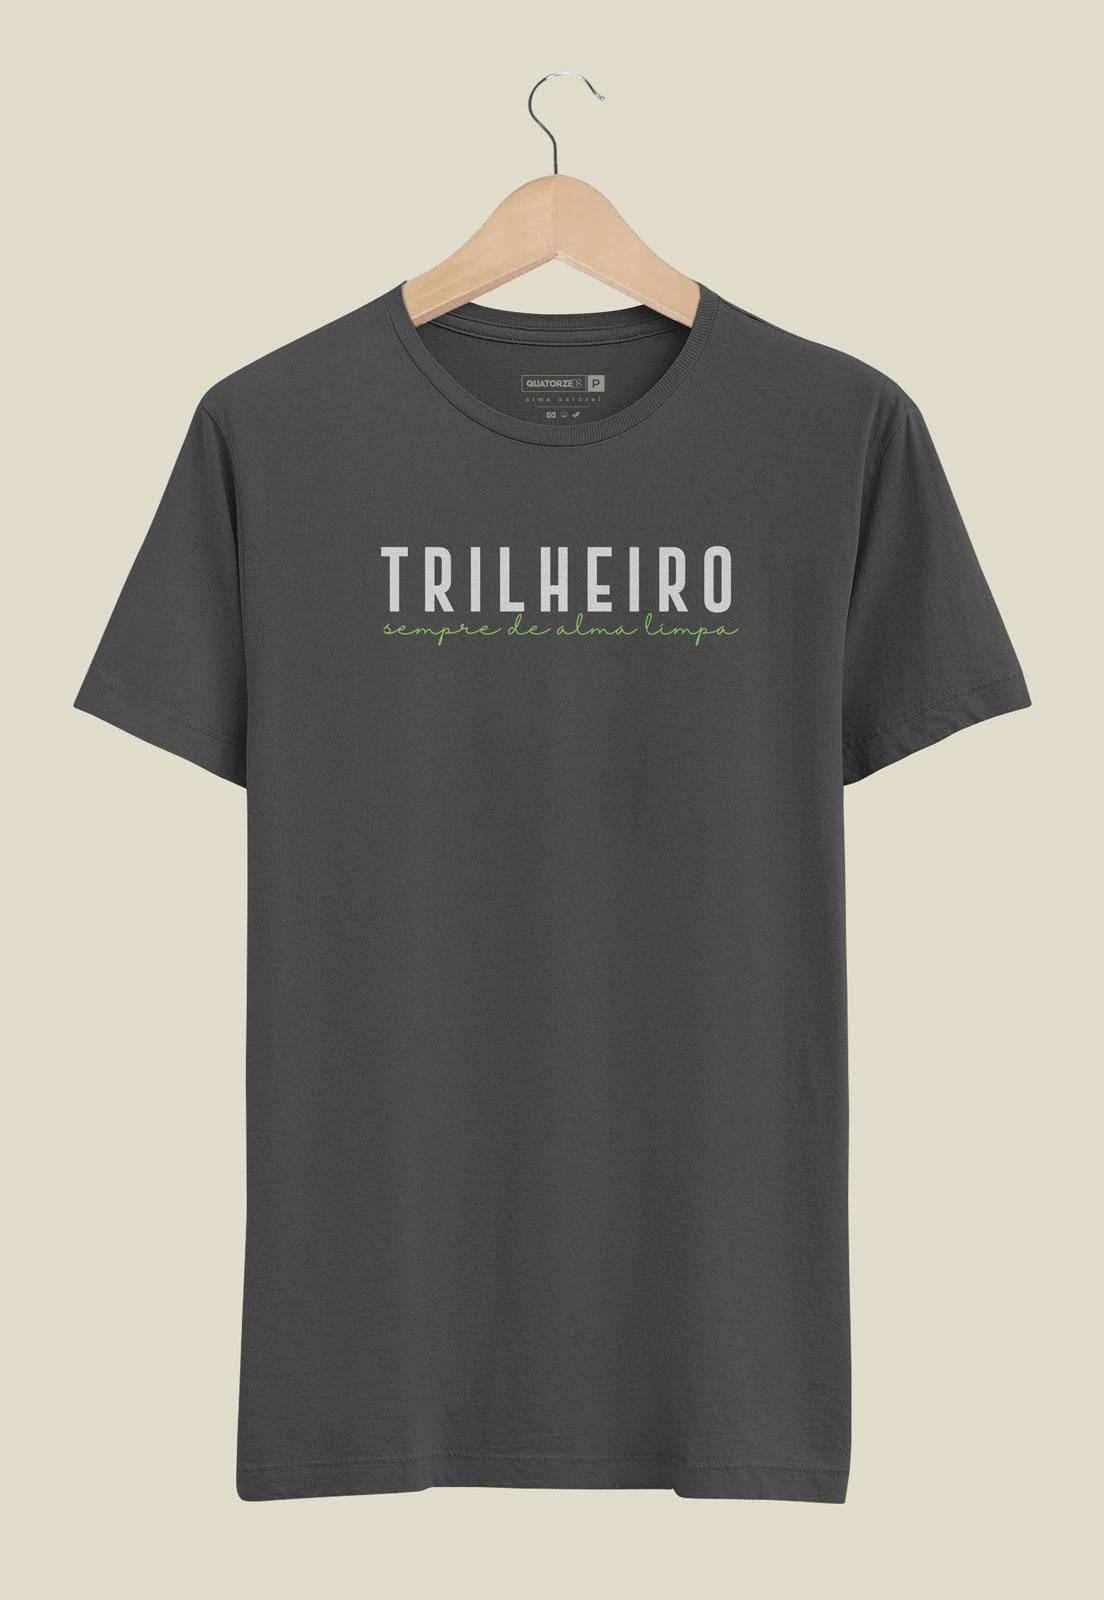 Camiseta Trilheiro Chumbo Estonada